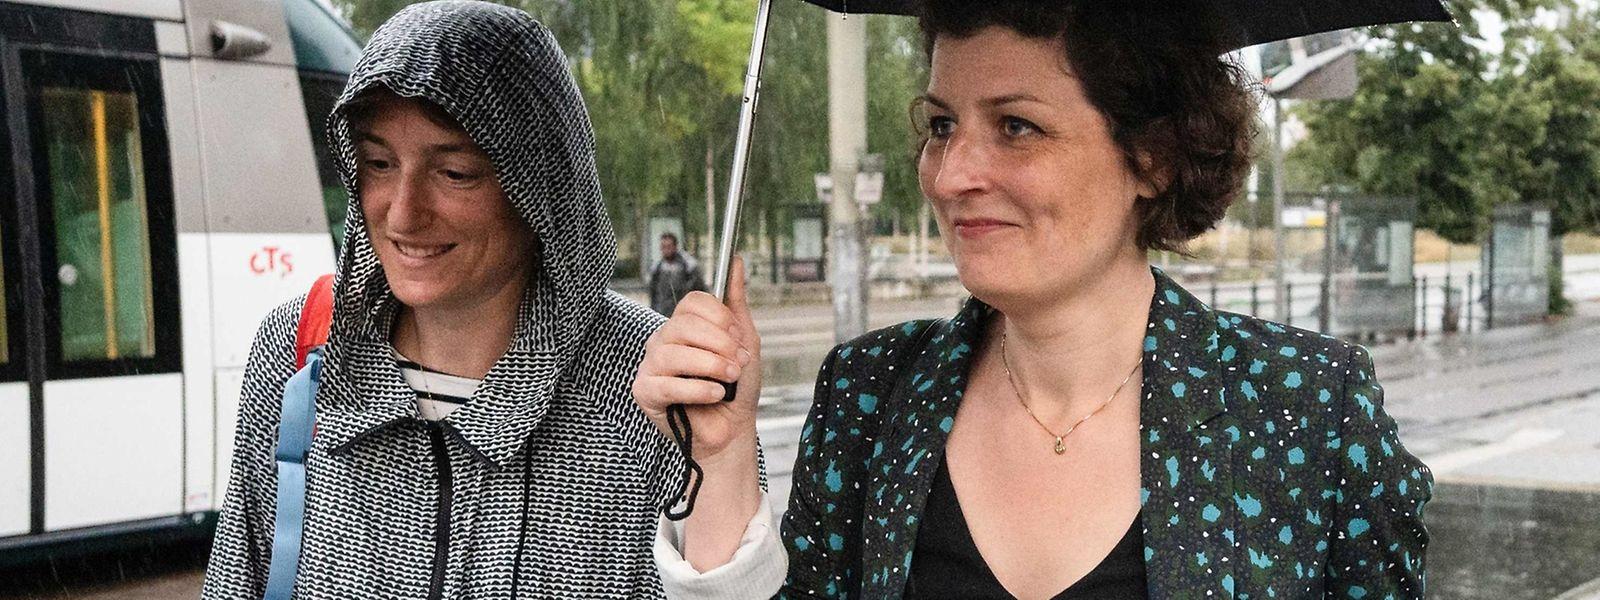 Jeanne Barseghian (rechts) wird Bürgermeisterin in Straßburg.